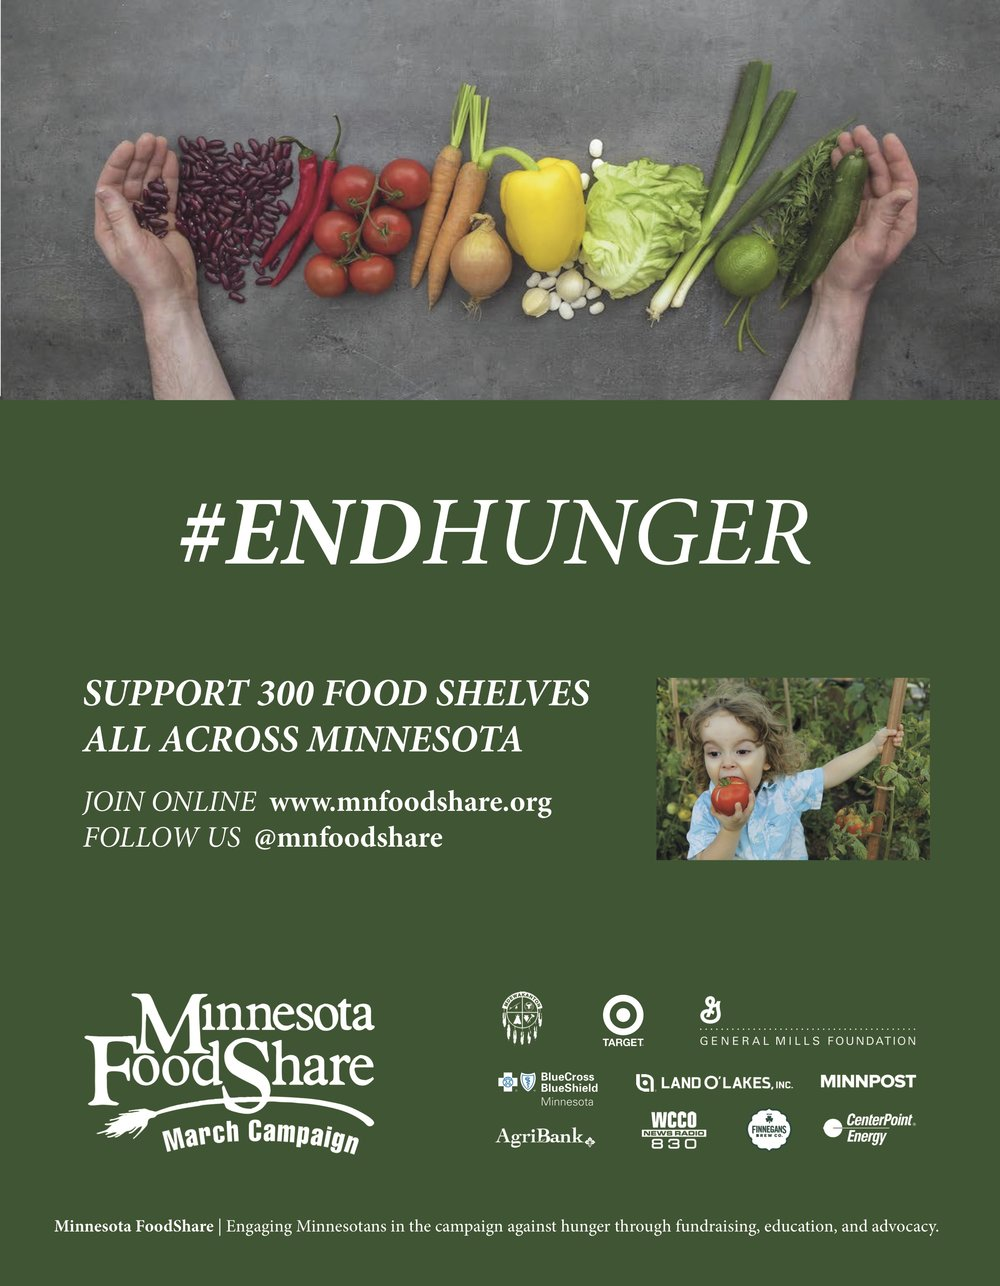 Minnesota FoodShare